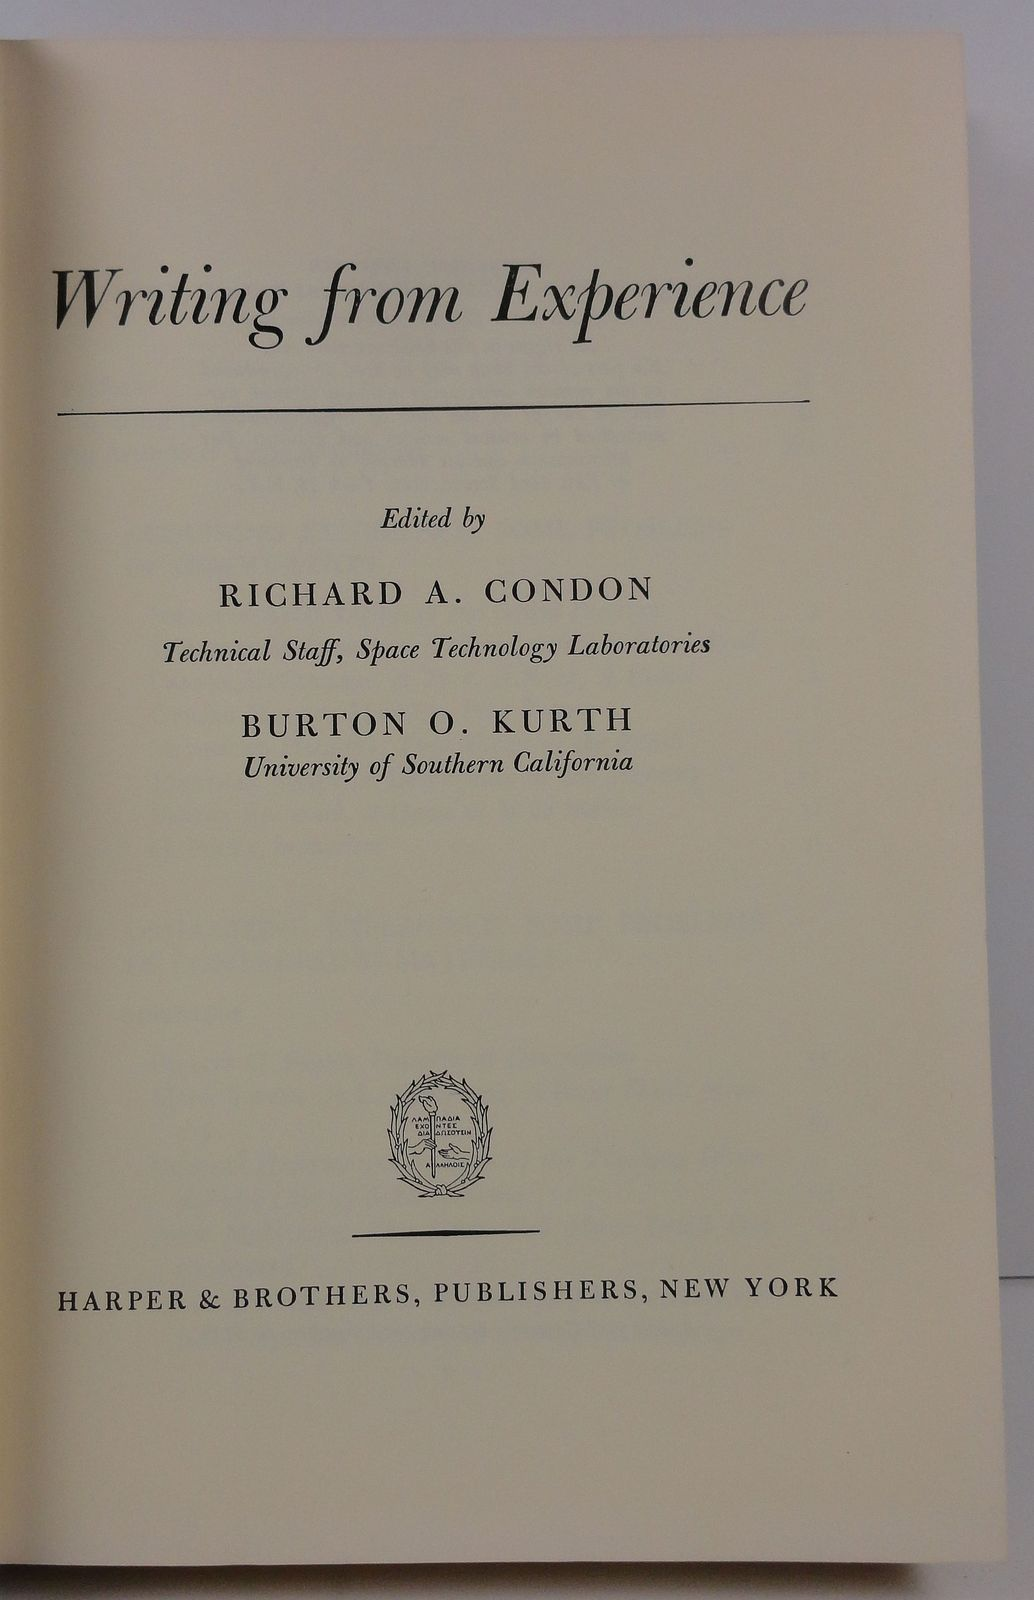 Writing from Experience by Richard A. Condon Burton O. Kurth